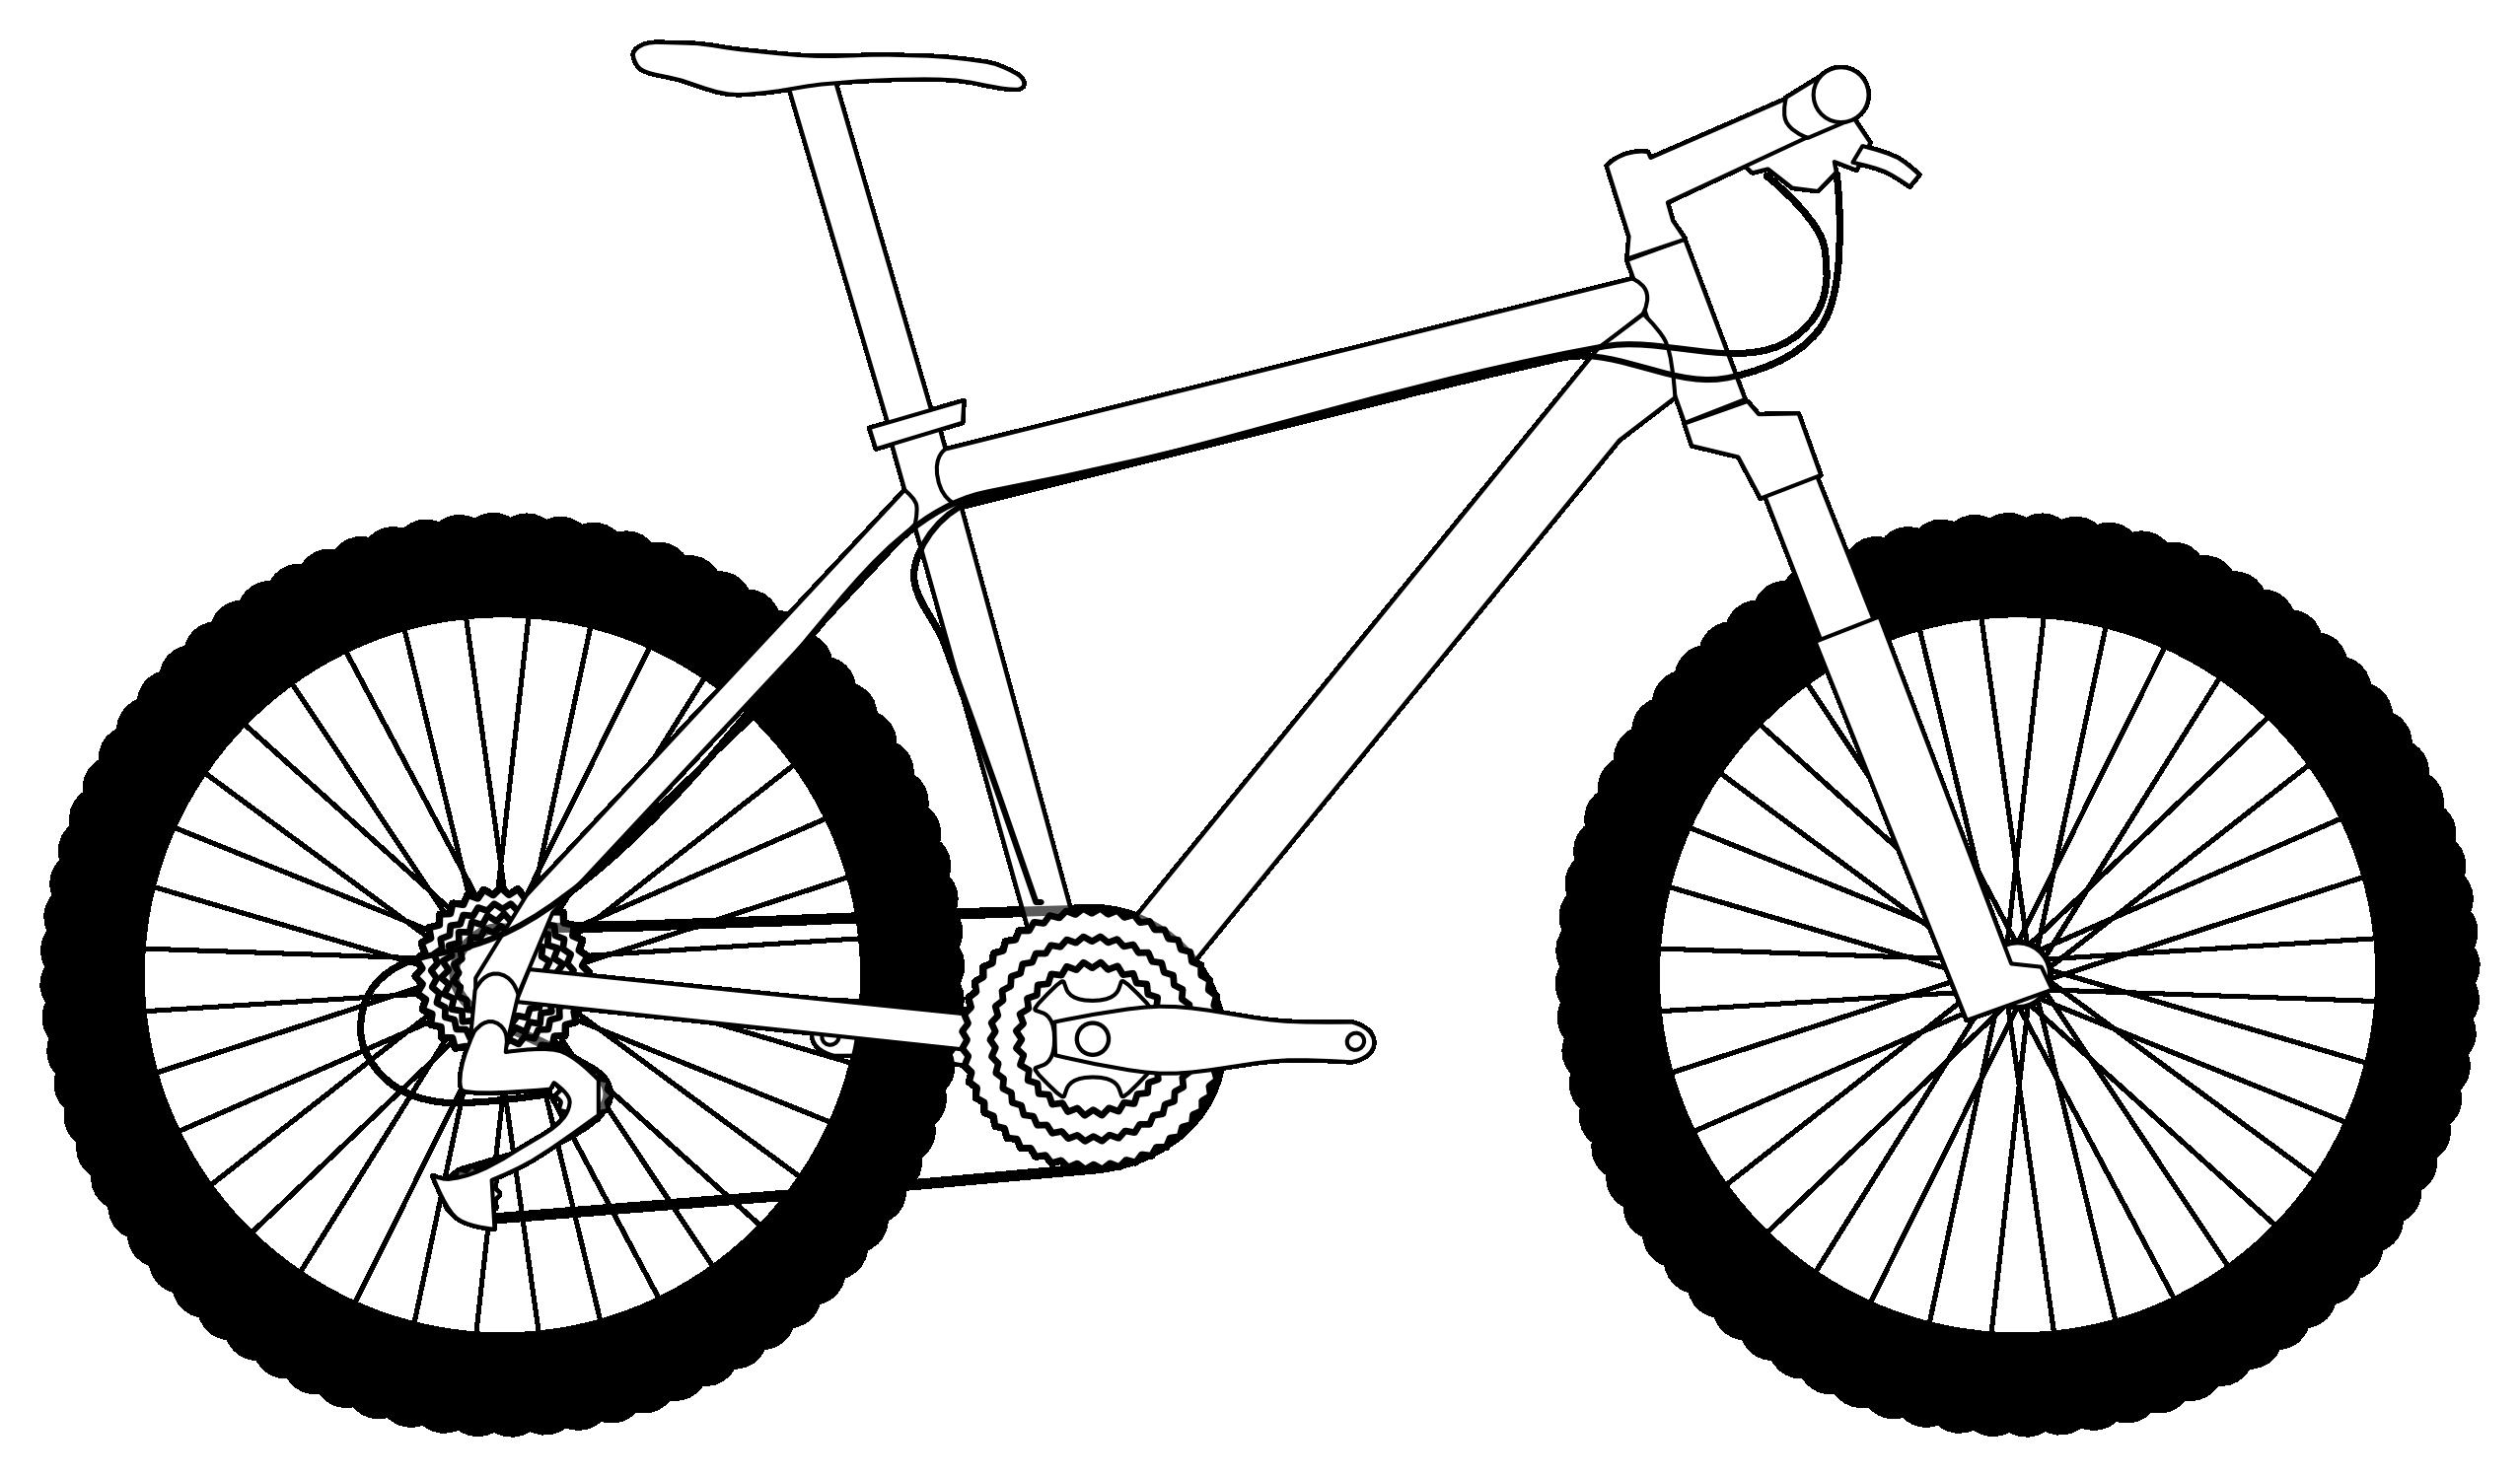 2555x1498 Bicycle Bike Clipart 6 Bikes Clip Art 3 Image 2